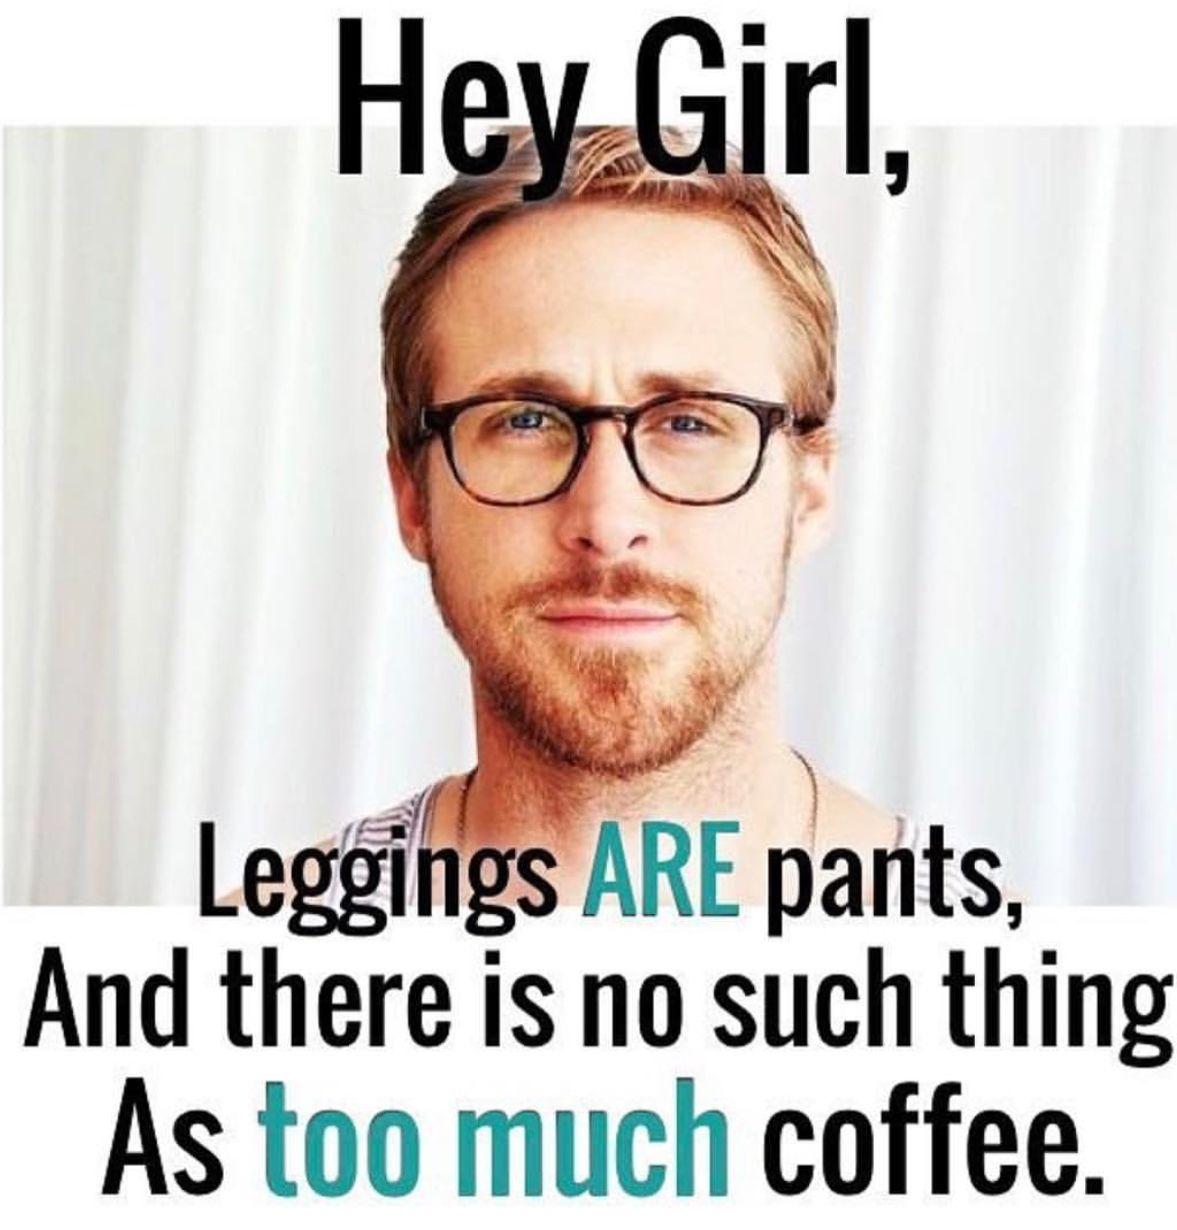 Leggings Are Pants Get Yours Peach Soft Leggings At Www Twistedwear Me Lularoe Meme Hey Girl Memes Girls In Leggings